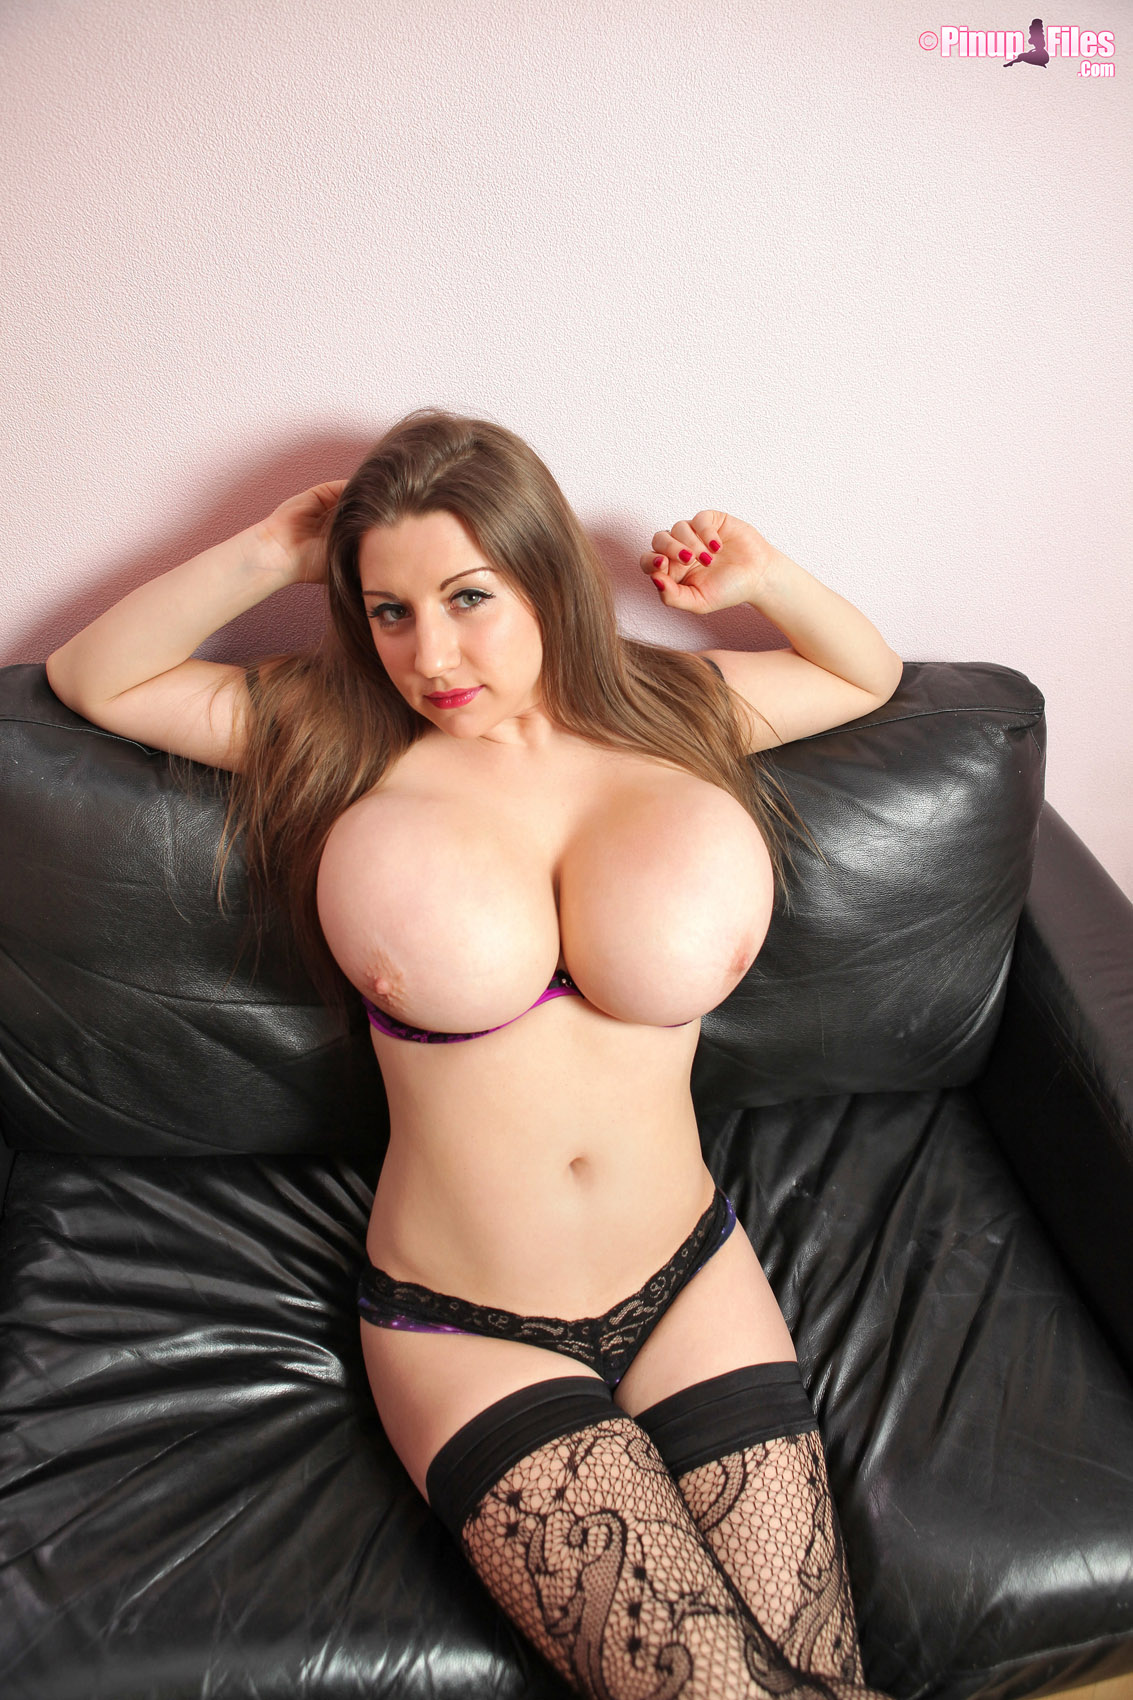 Samantha vegas big tits